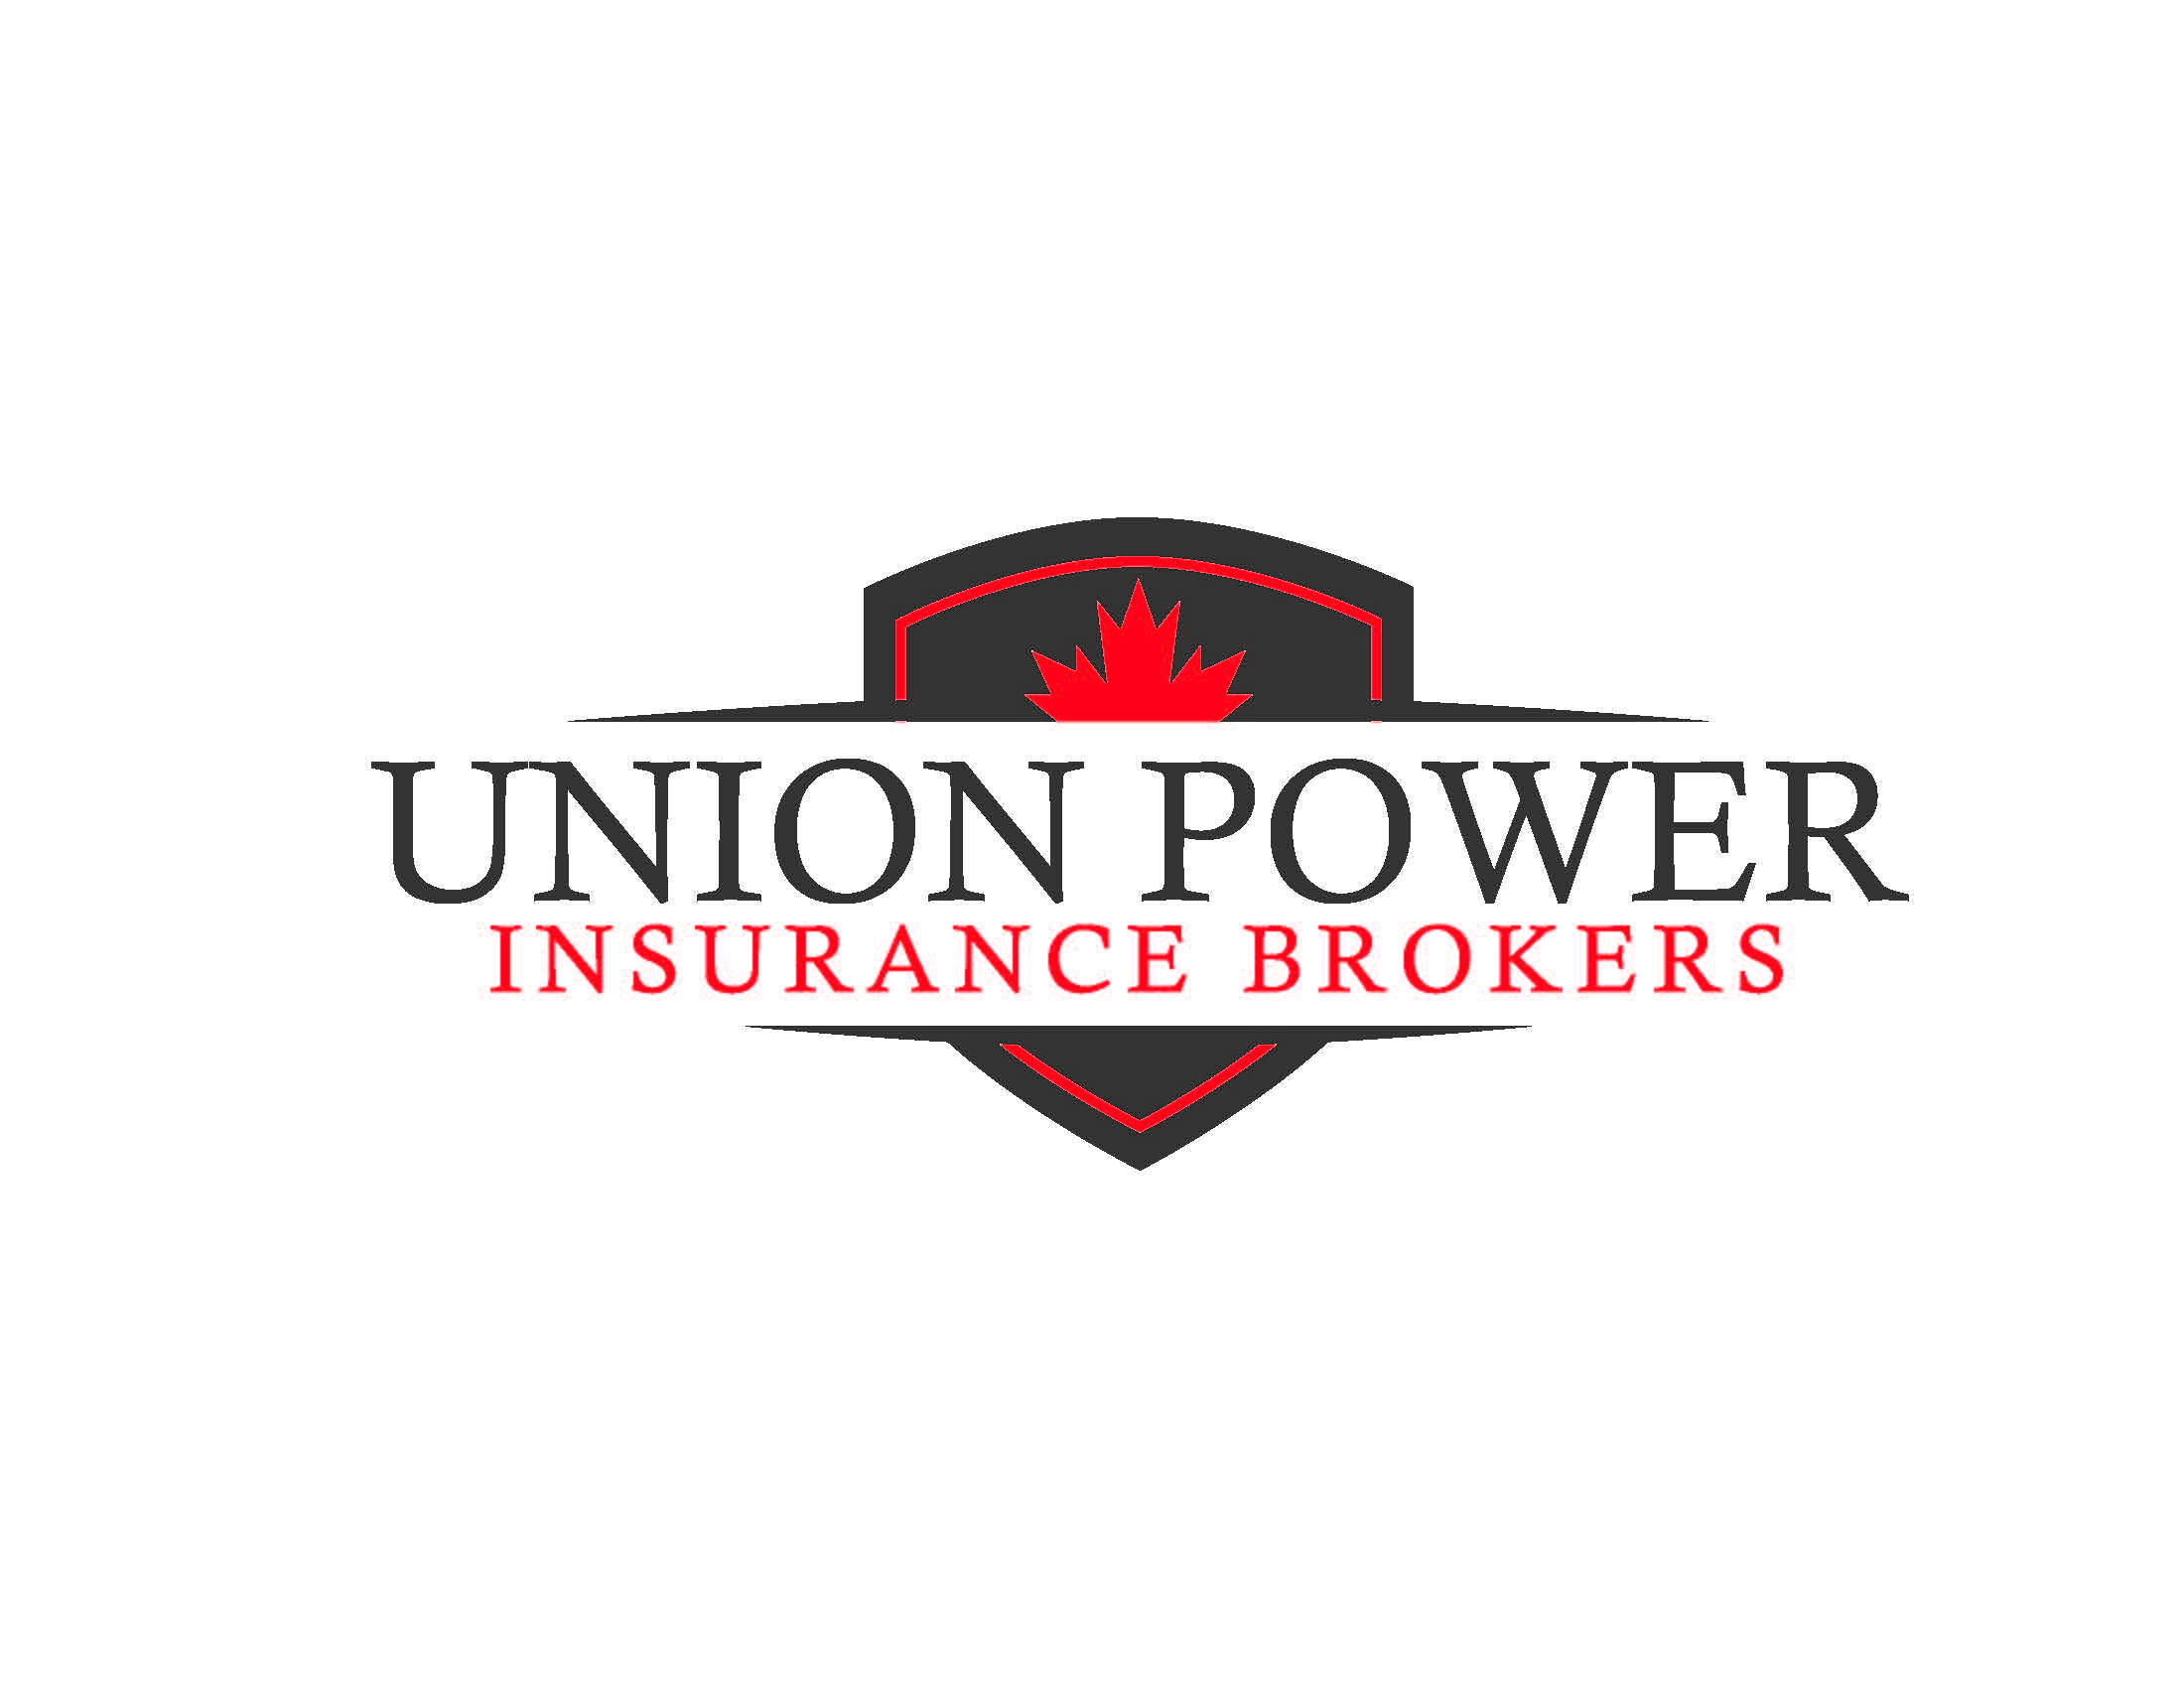 Union Power Insurance Brokers Inc.